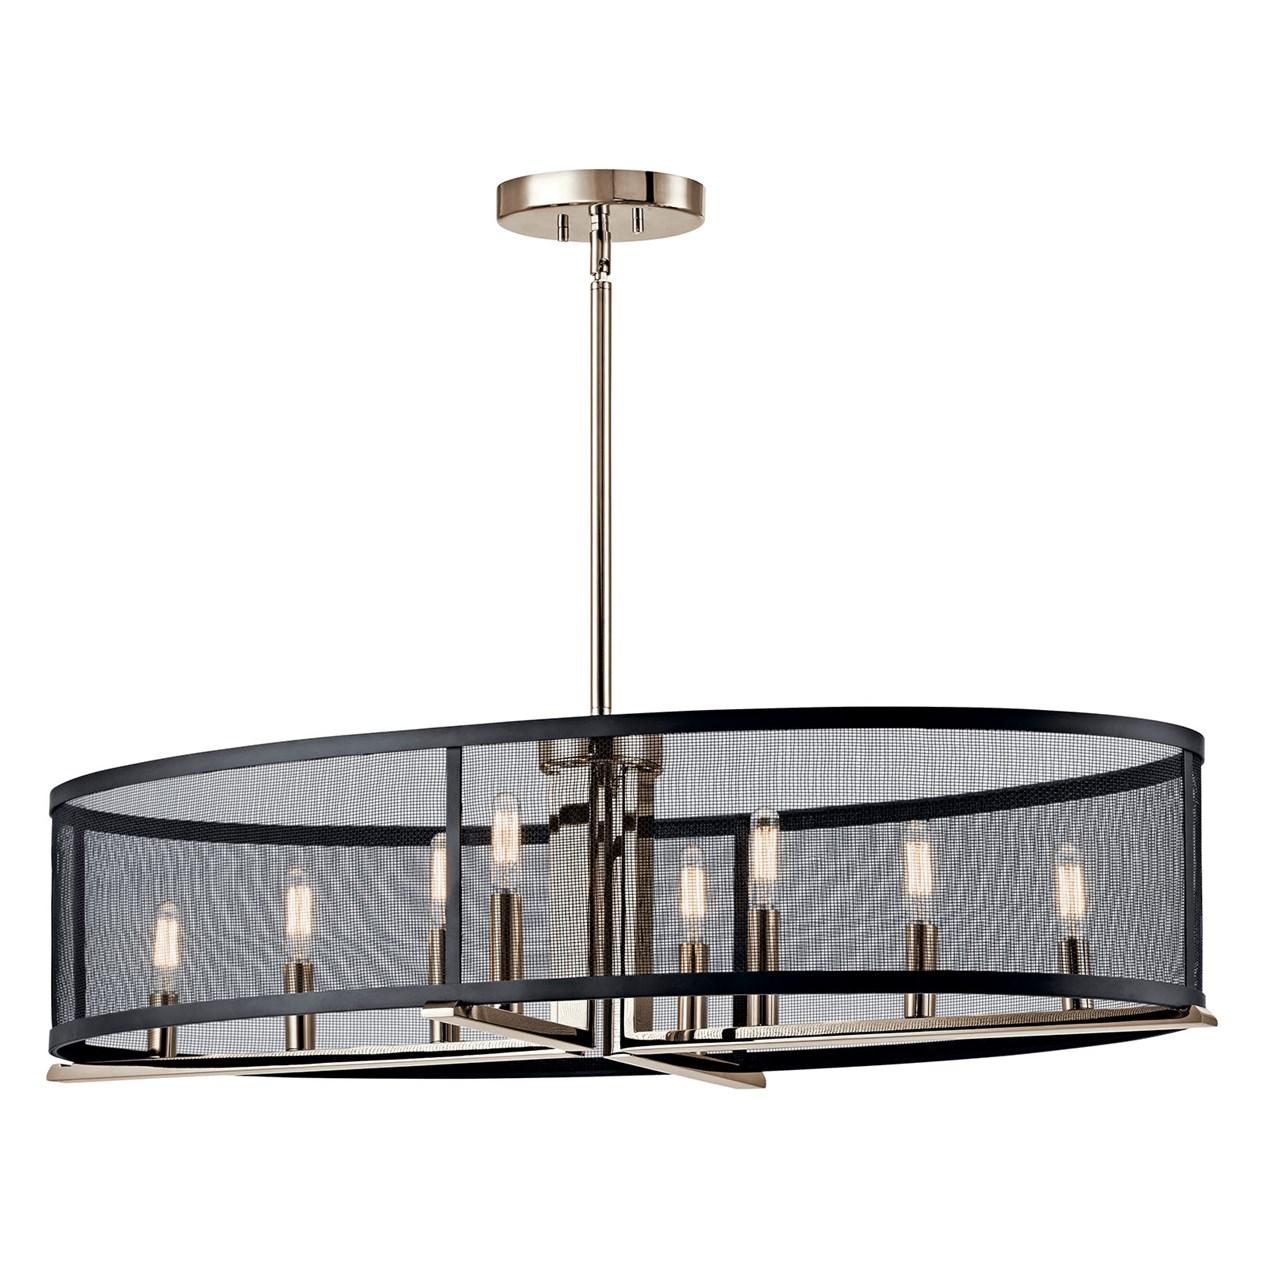 Titus 8 Light Oval Chandelier Polished Nickel Kichler Lighting